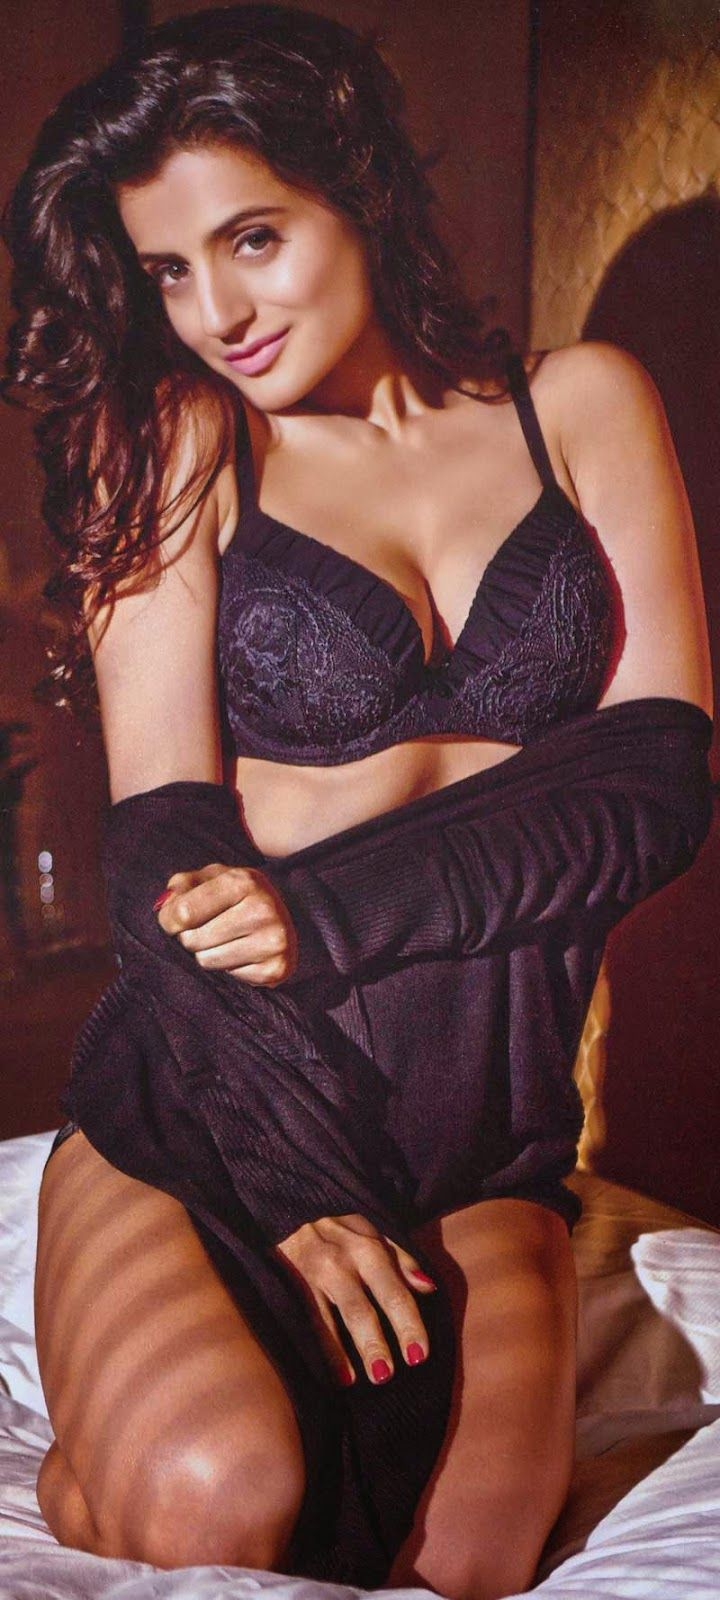 Amisha Patel Hot Boobs Pics pin on milf